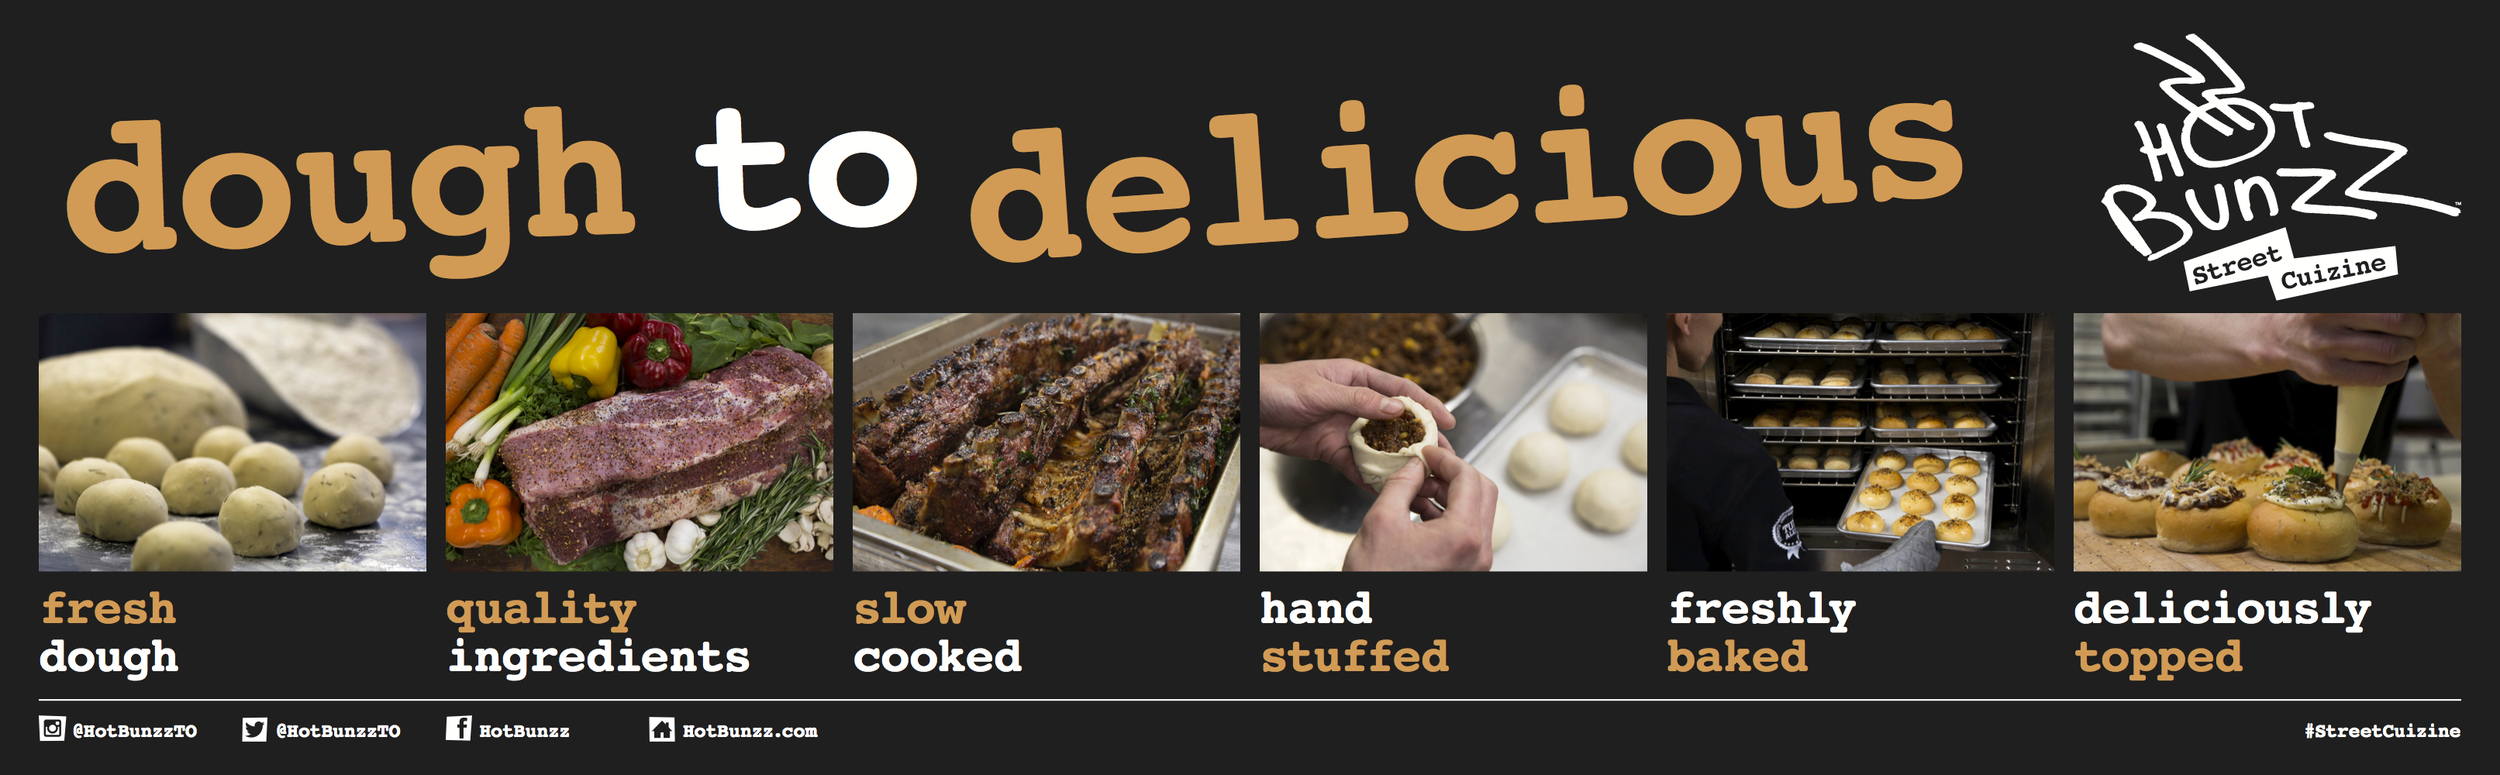 Dough_to_Delicious_Horizontal.jpg